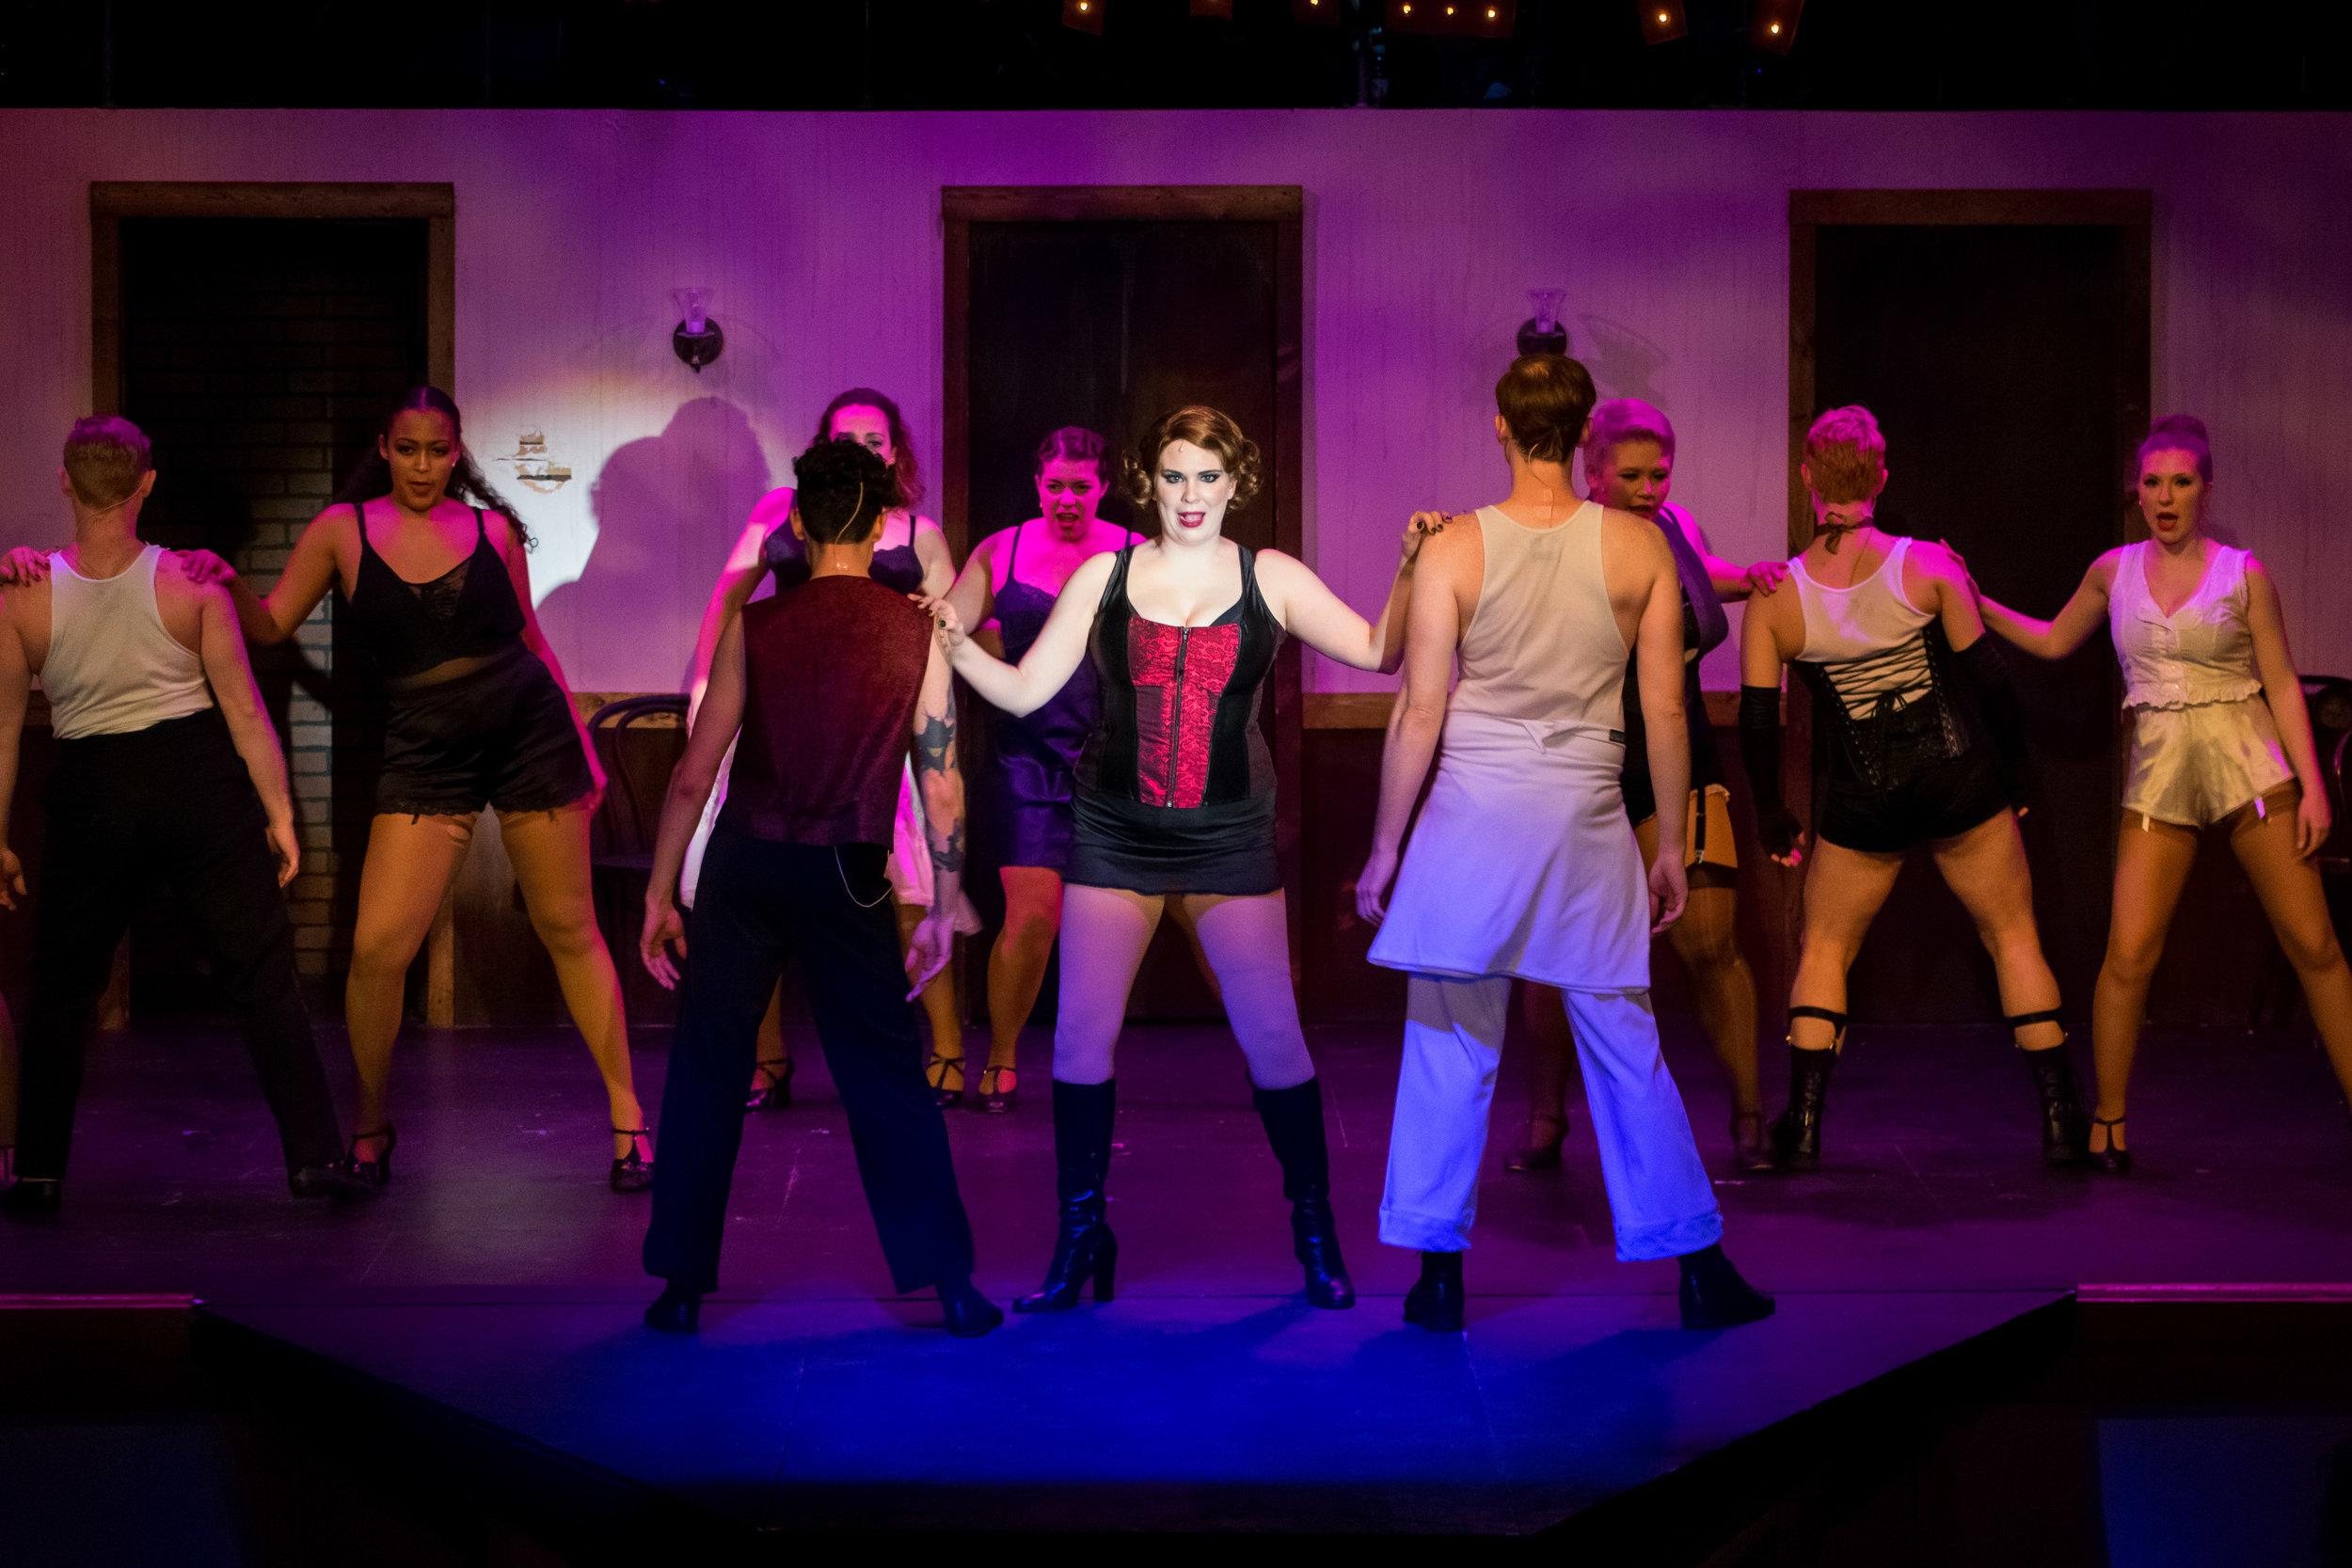 Megan Mostow (C) as Sally Bowles, with the Kit Kat Dancers